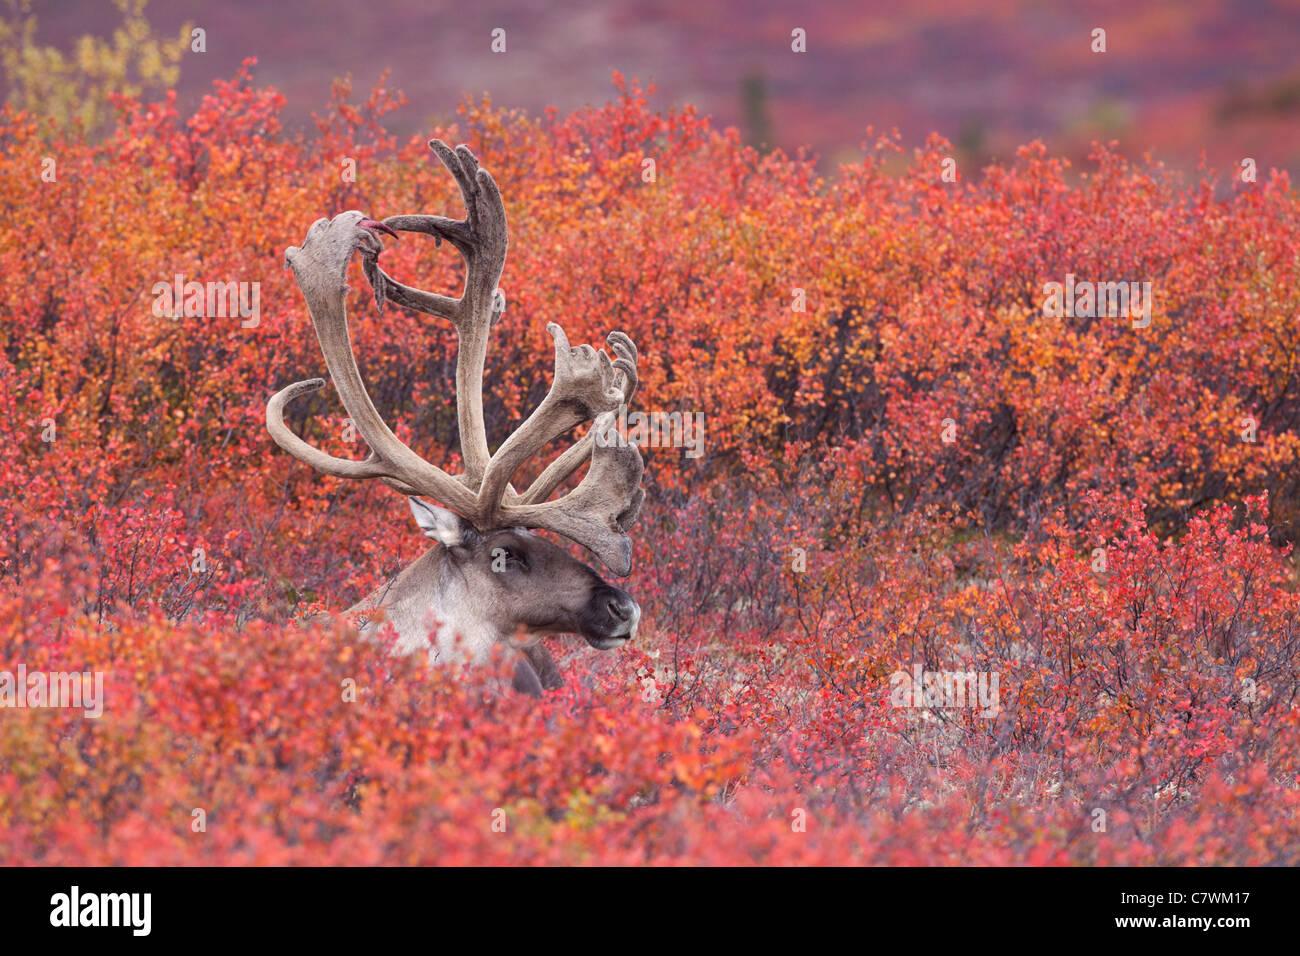 Bull caribou, Denali National Park, Alaska. - Stock Image